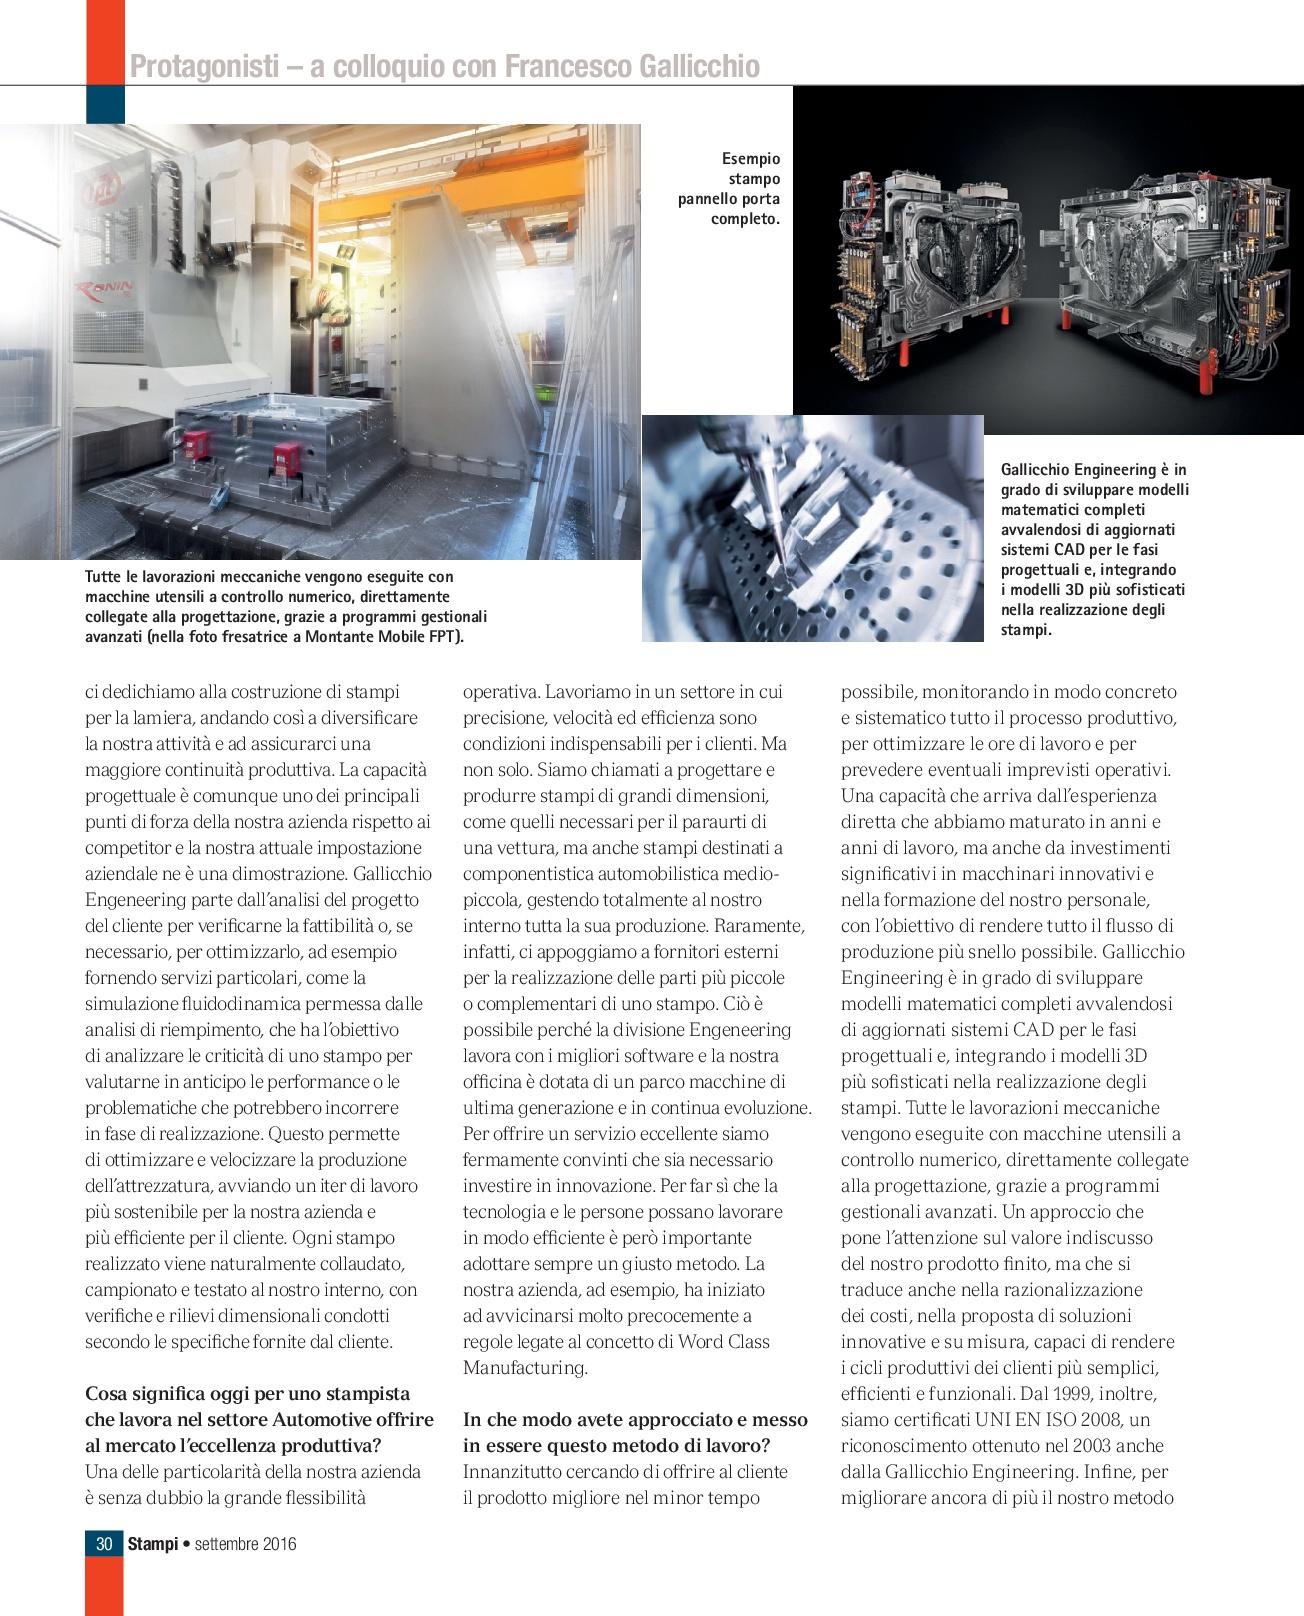 13.giornalismo_stampi_automotive_gallicchio-003